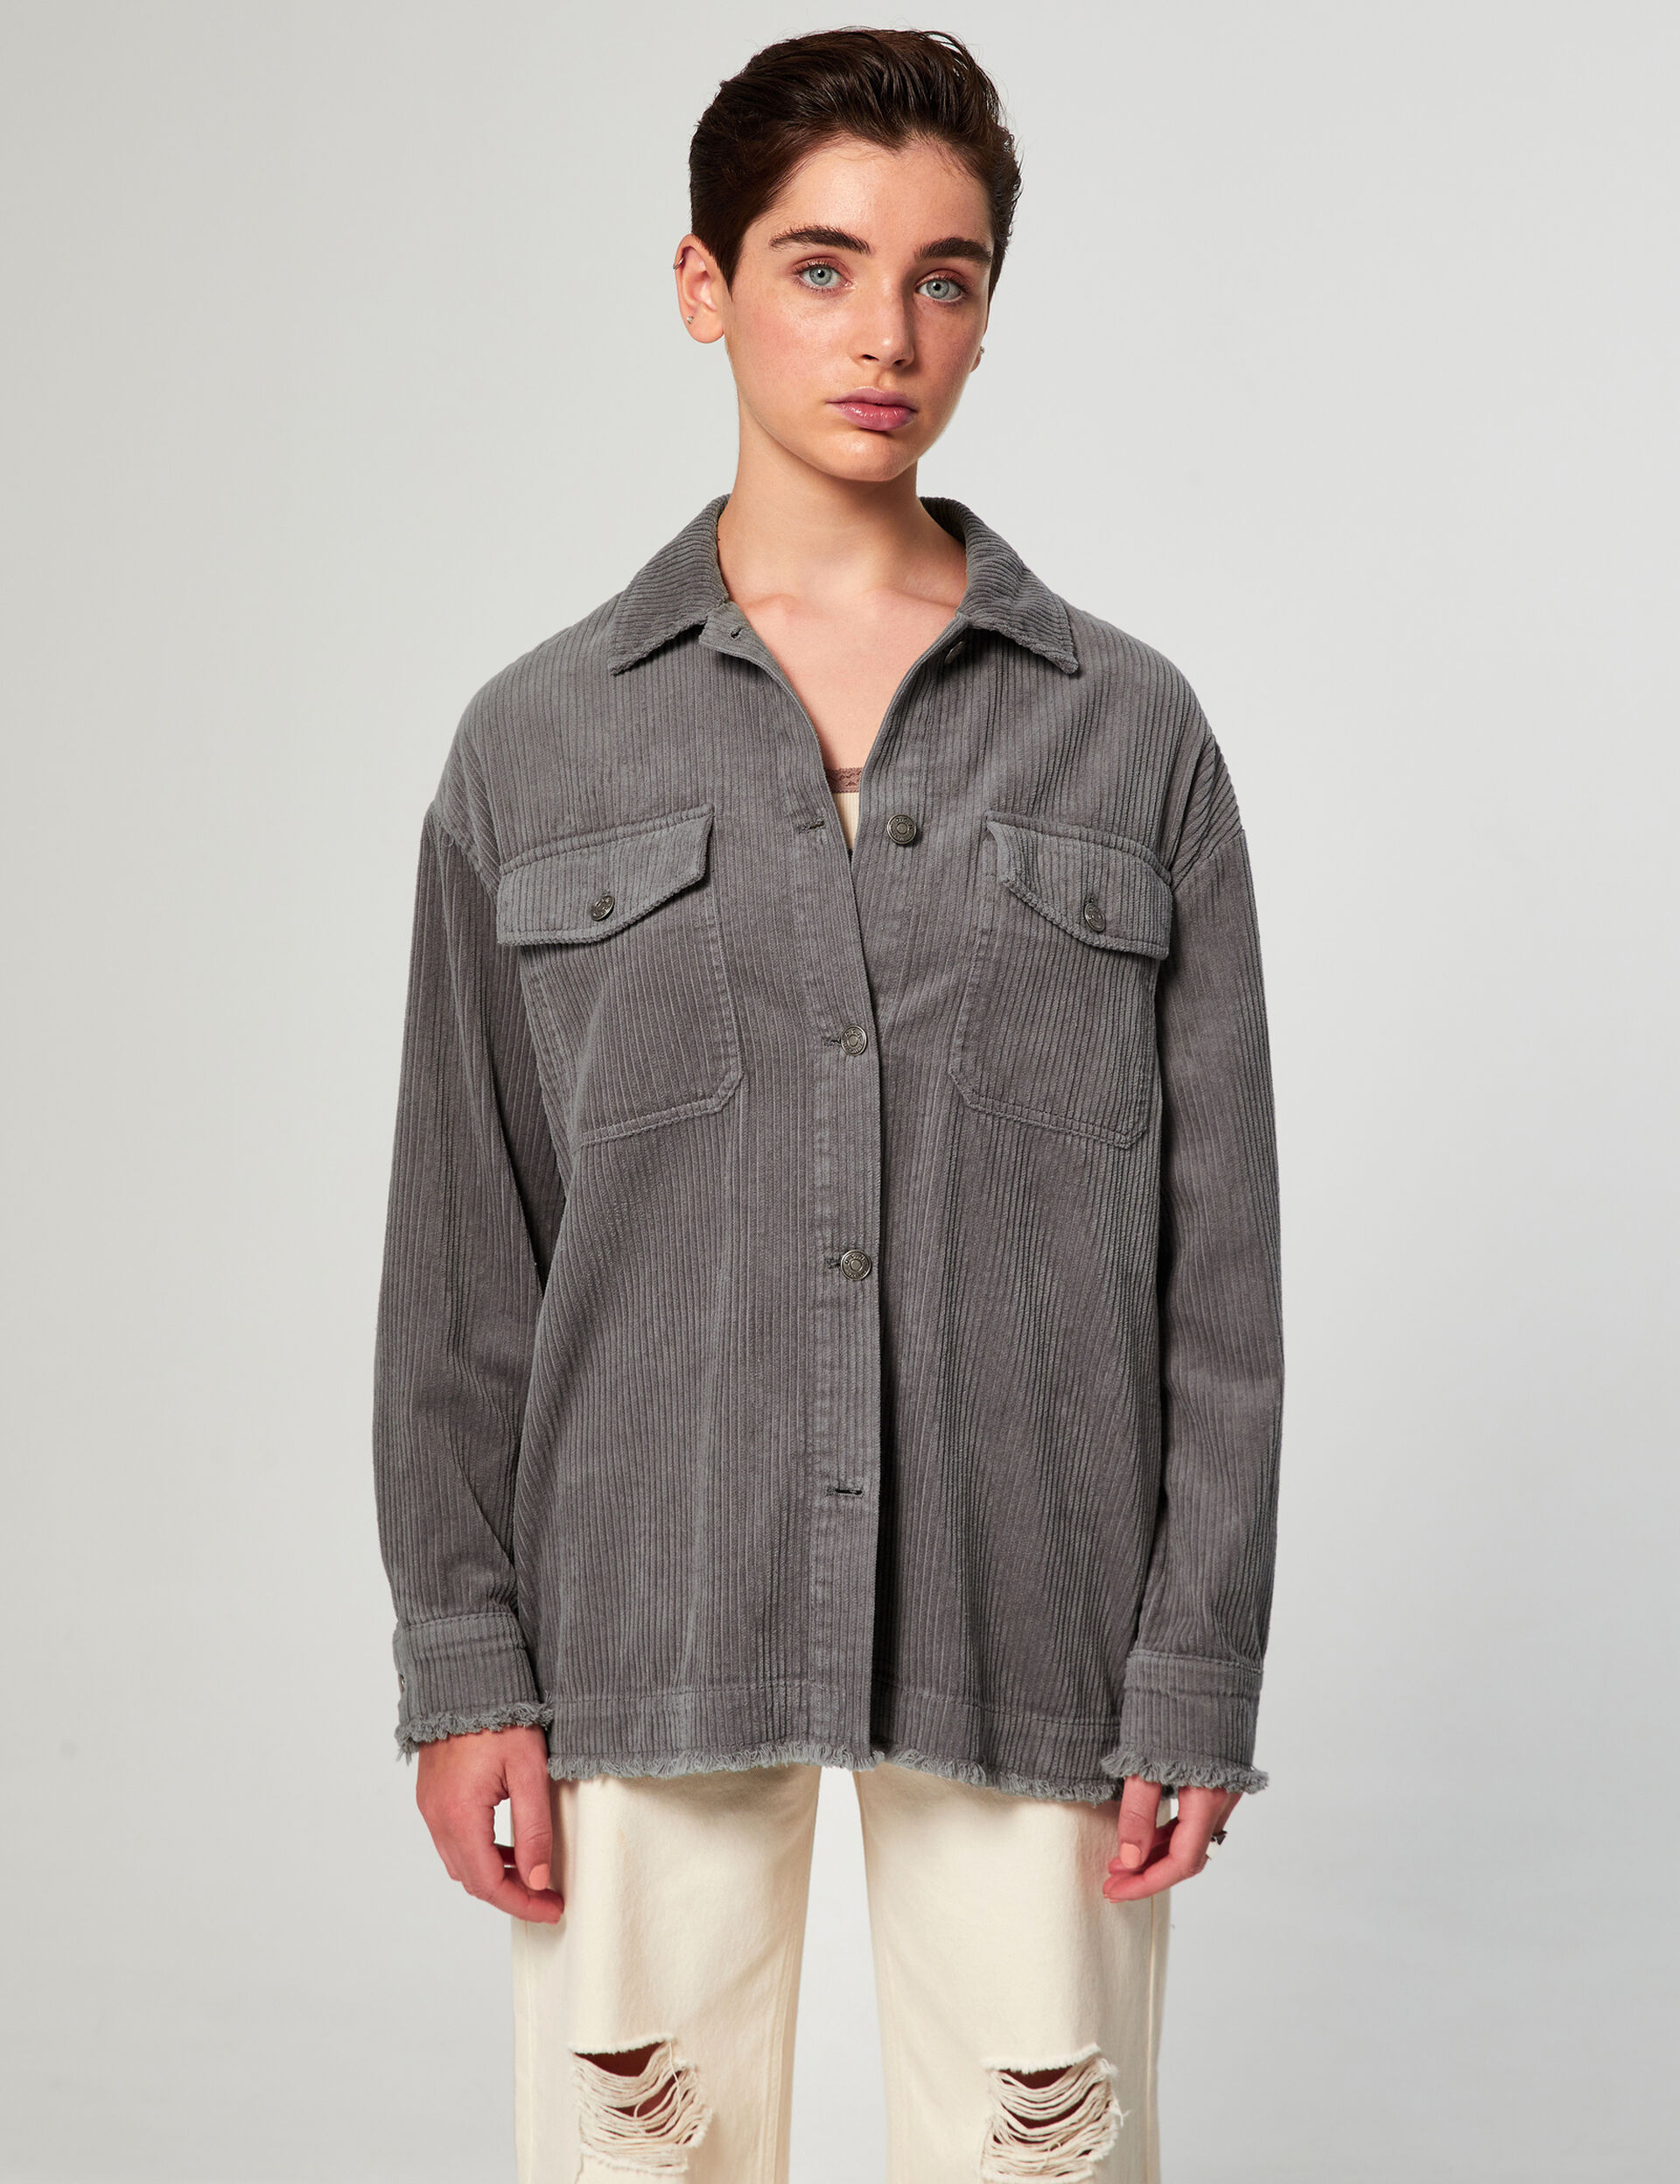 Ribbed overshirt